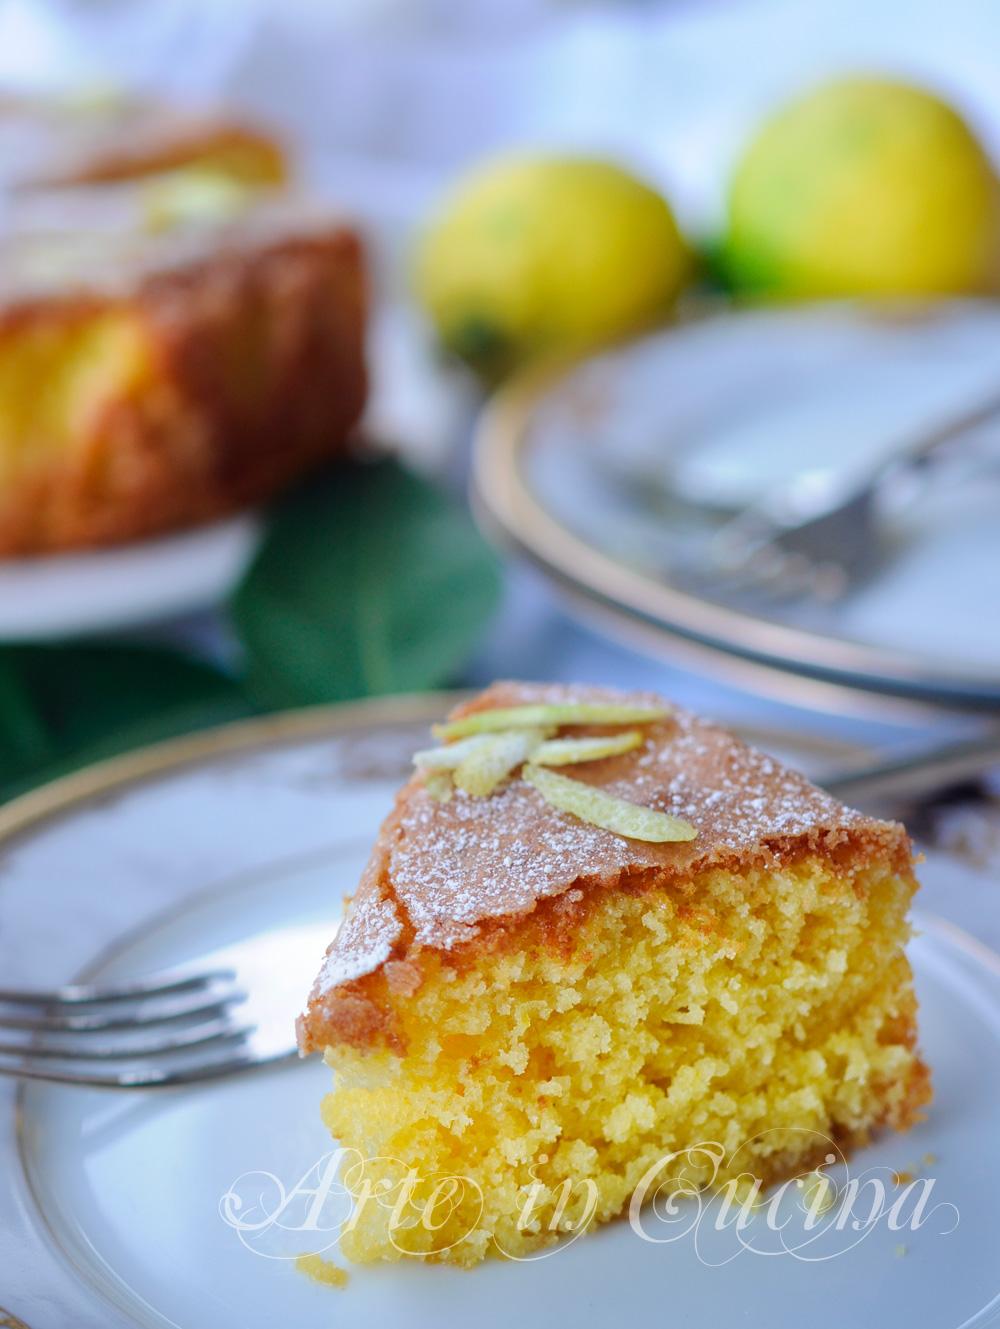 Torta madeira al limone dolce facile e veloce vickyart arte in cucina